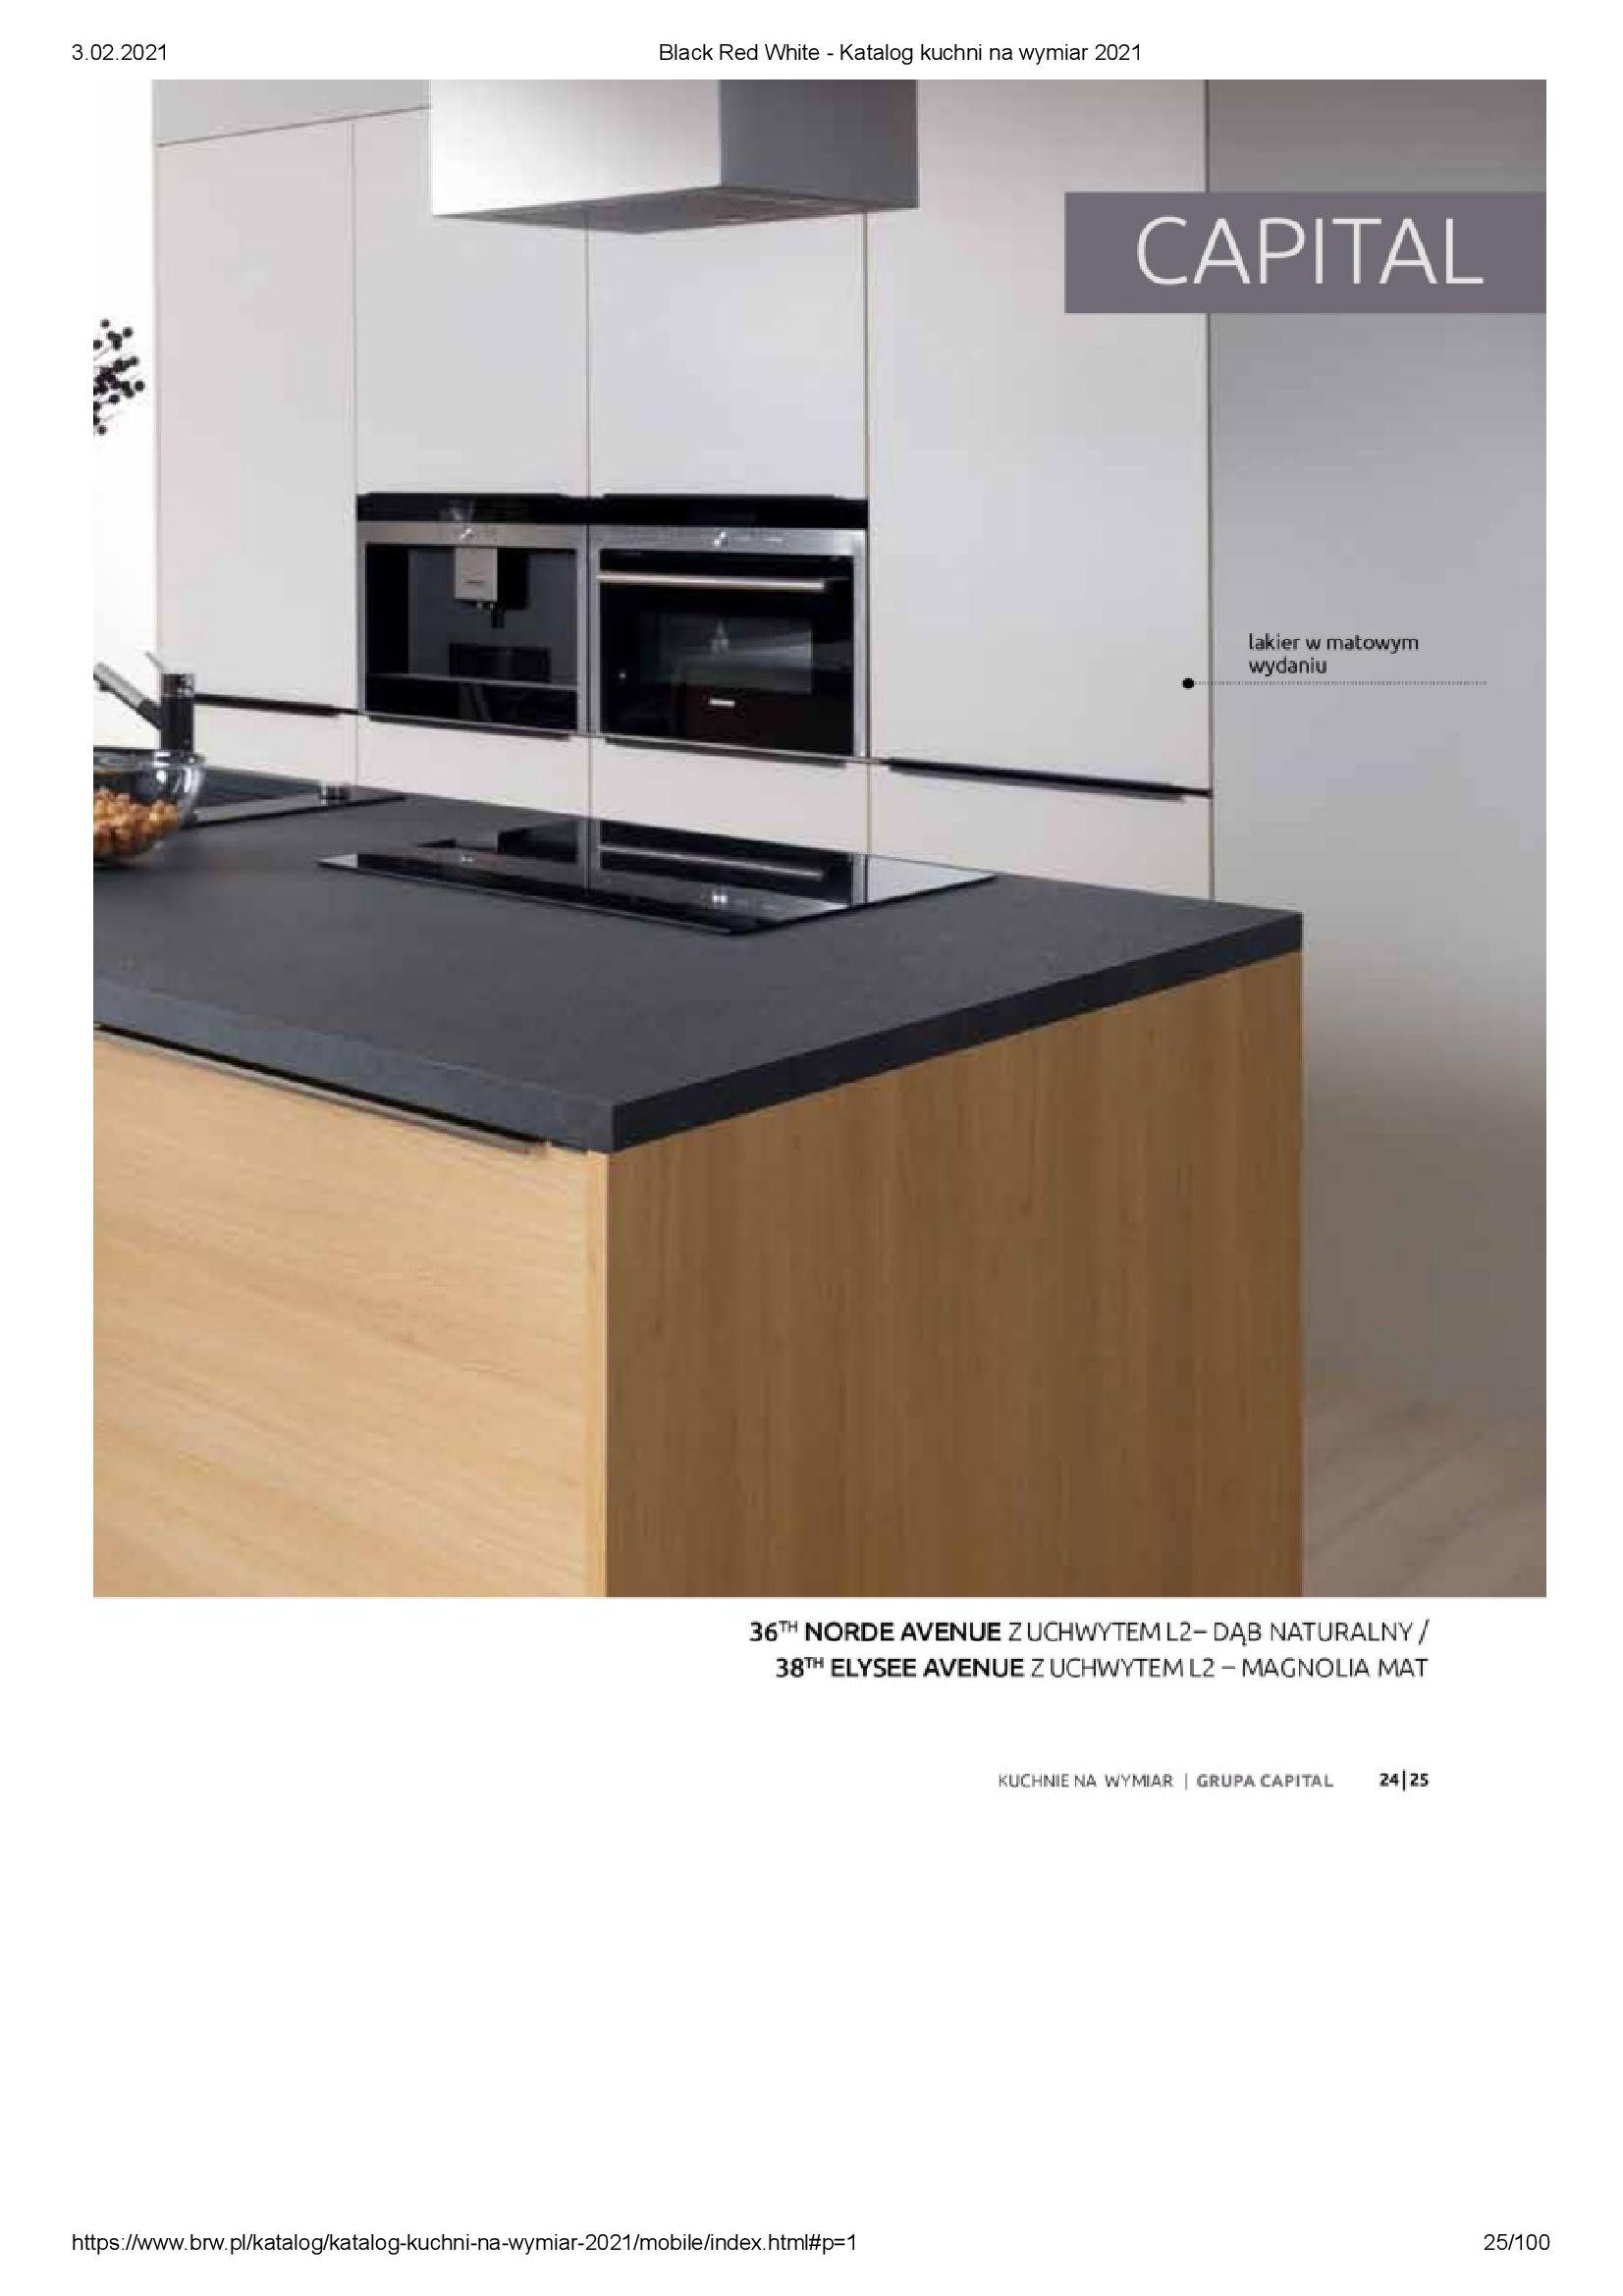 Gazetka Black Red White: Katalog - Kuchnie na wymiar Senso Kitchens 2021 2021-01-01 page-25